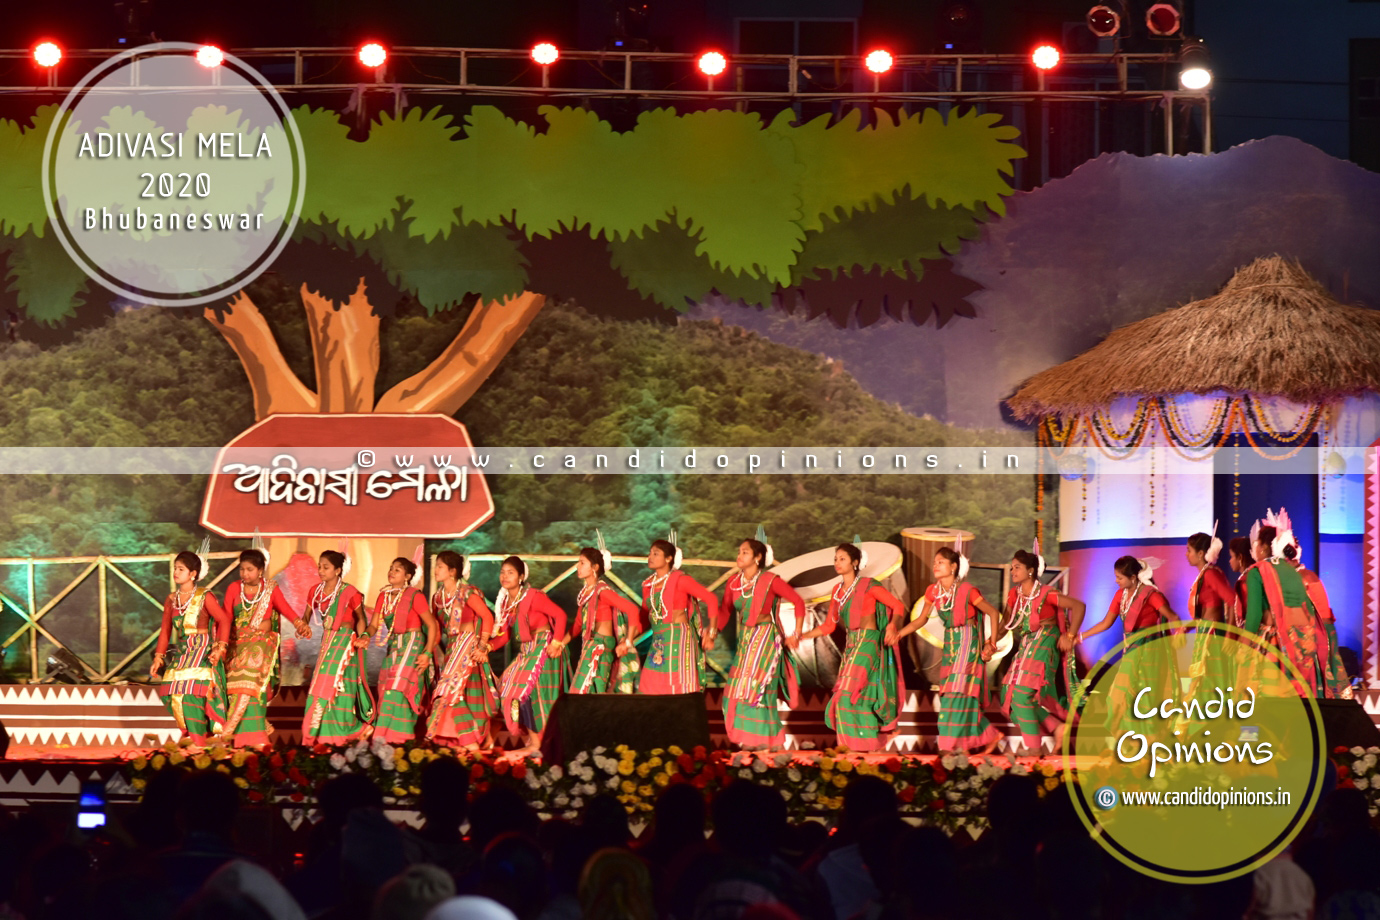 Adivashi Mela 2020, Bhubaneswar